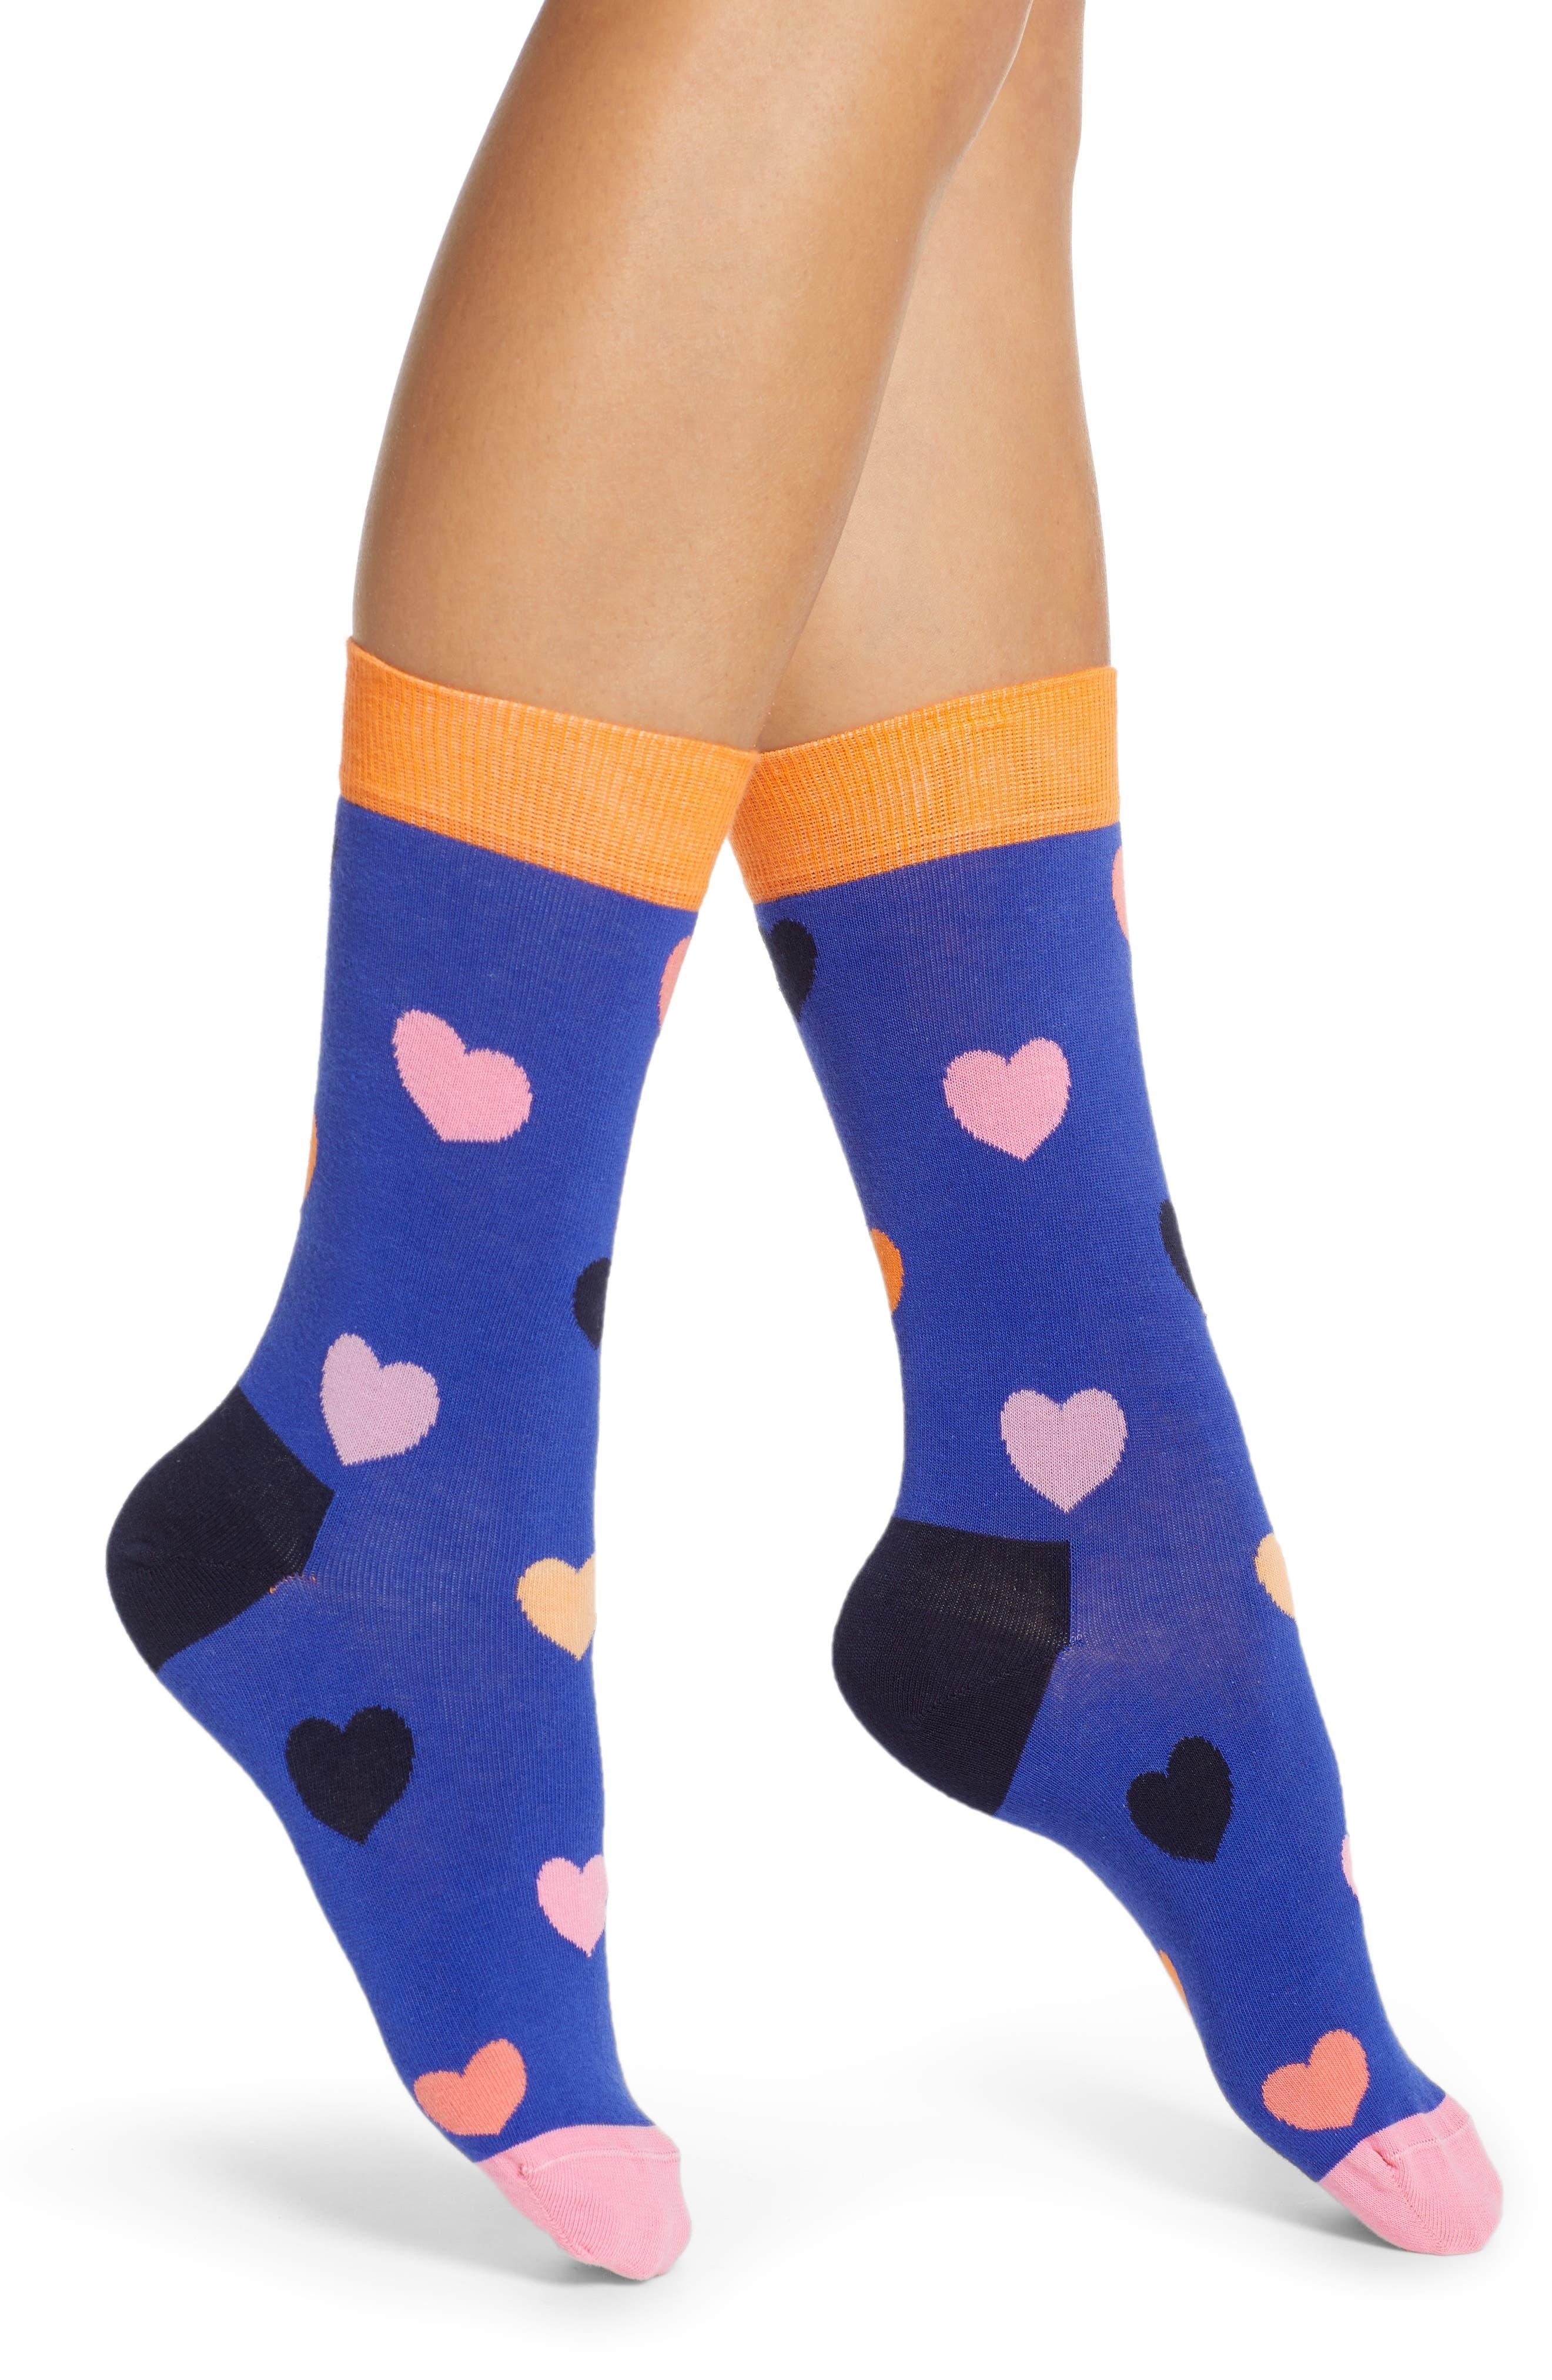 Heart Crew Socks,                             Main thumbnail 1, color,                             BLUE COMBO